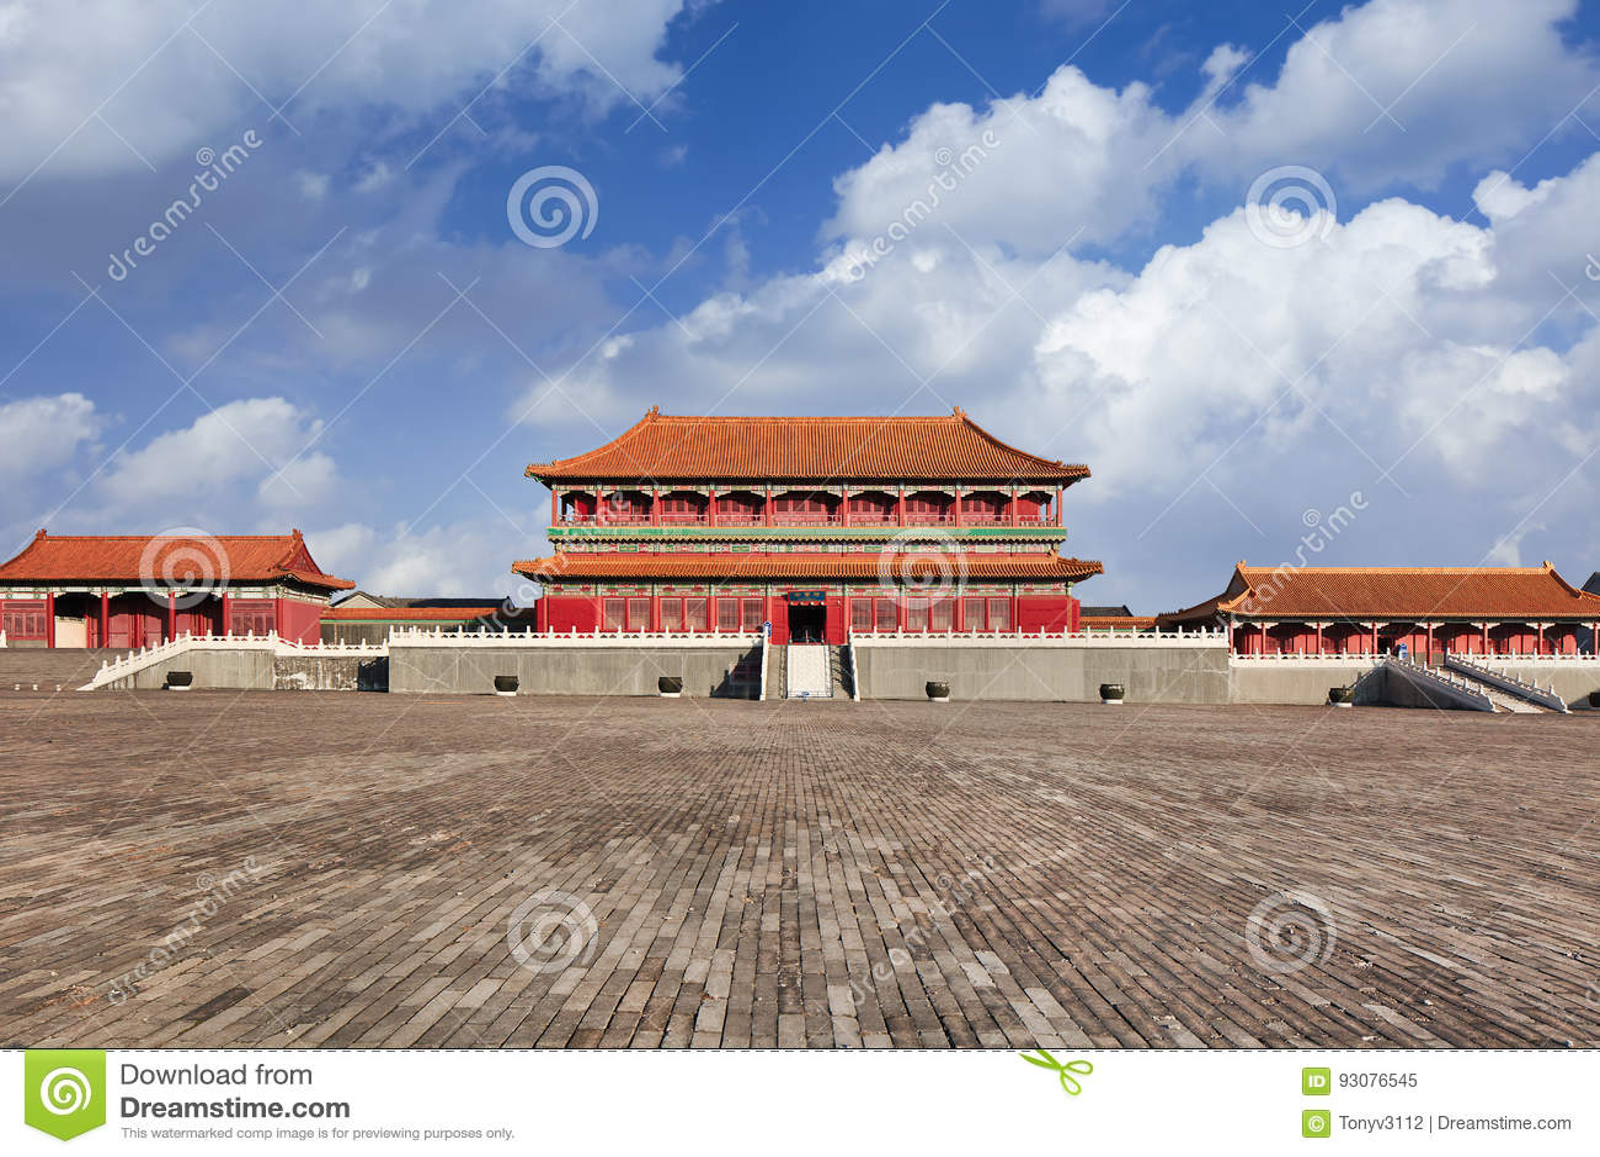 Replik des Pavillons der Verbotenen Stadt, Hengdian, China